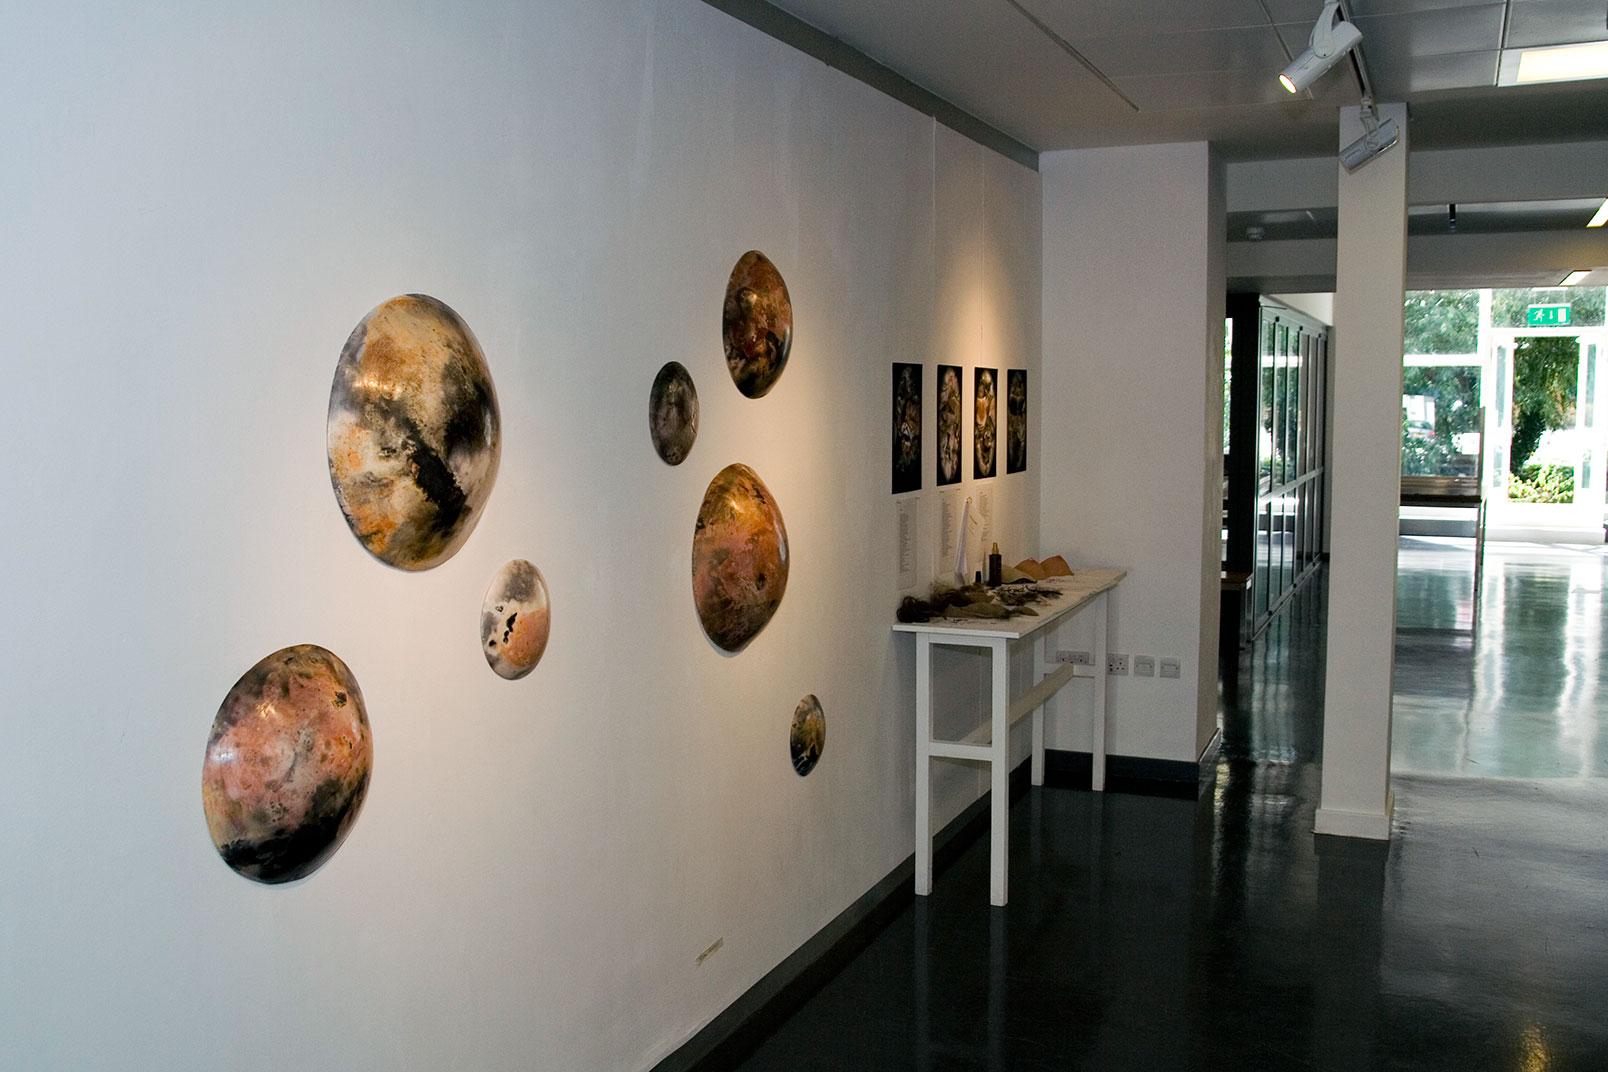 planets-on-display